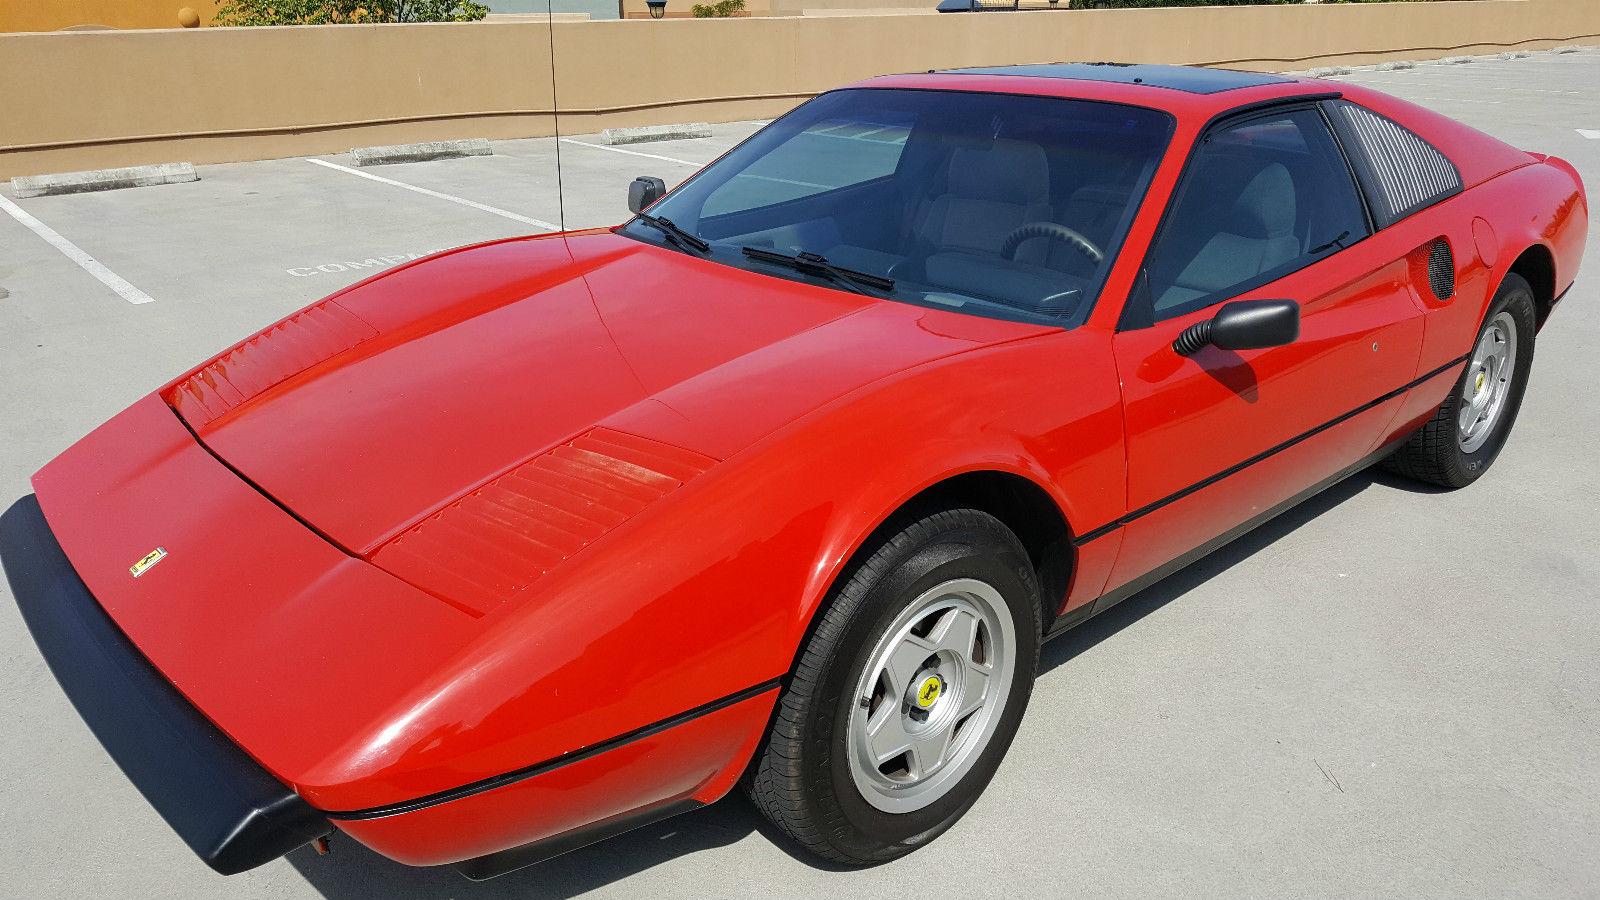 Look Up Vin >> Daily Turismo: Auction Watch: 1988 Pontiac Fiero Mera